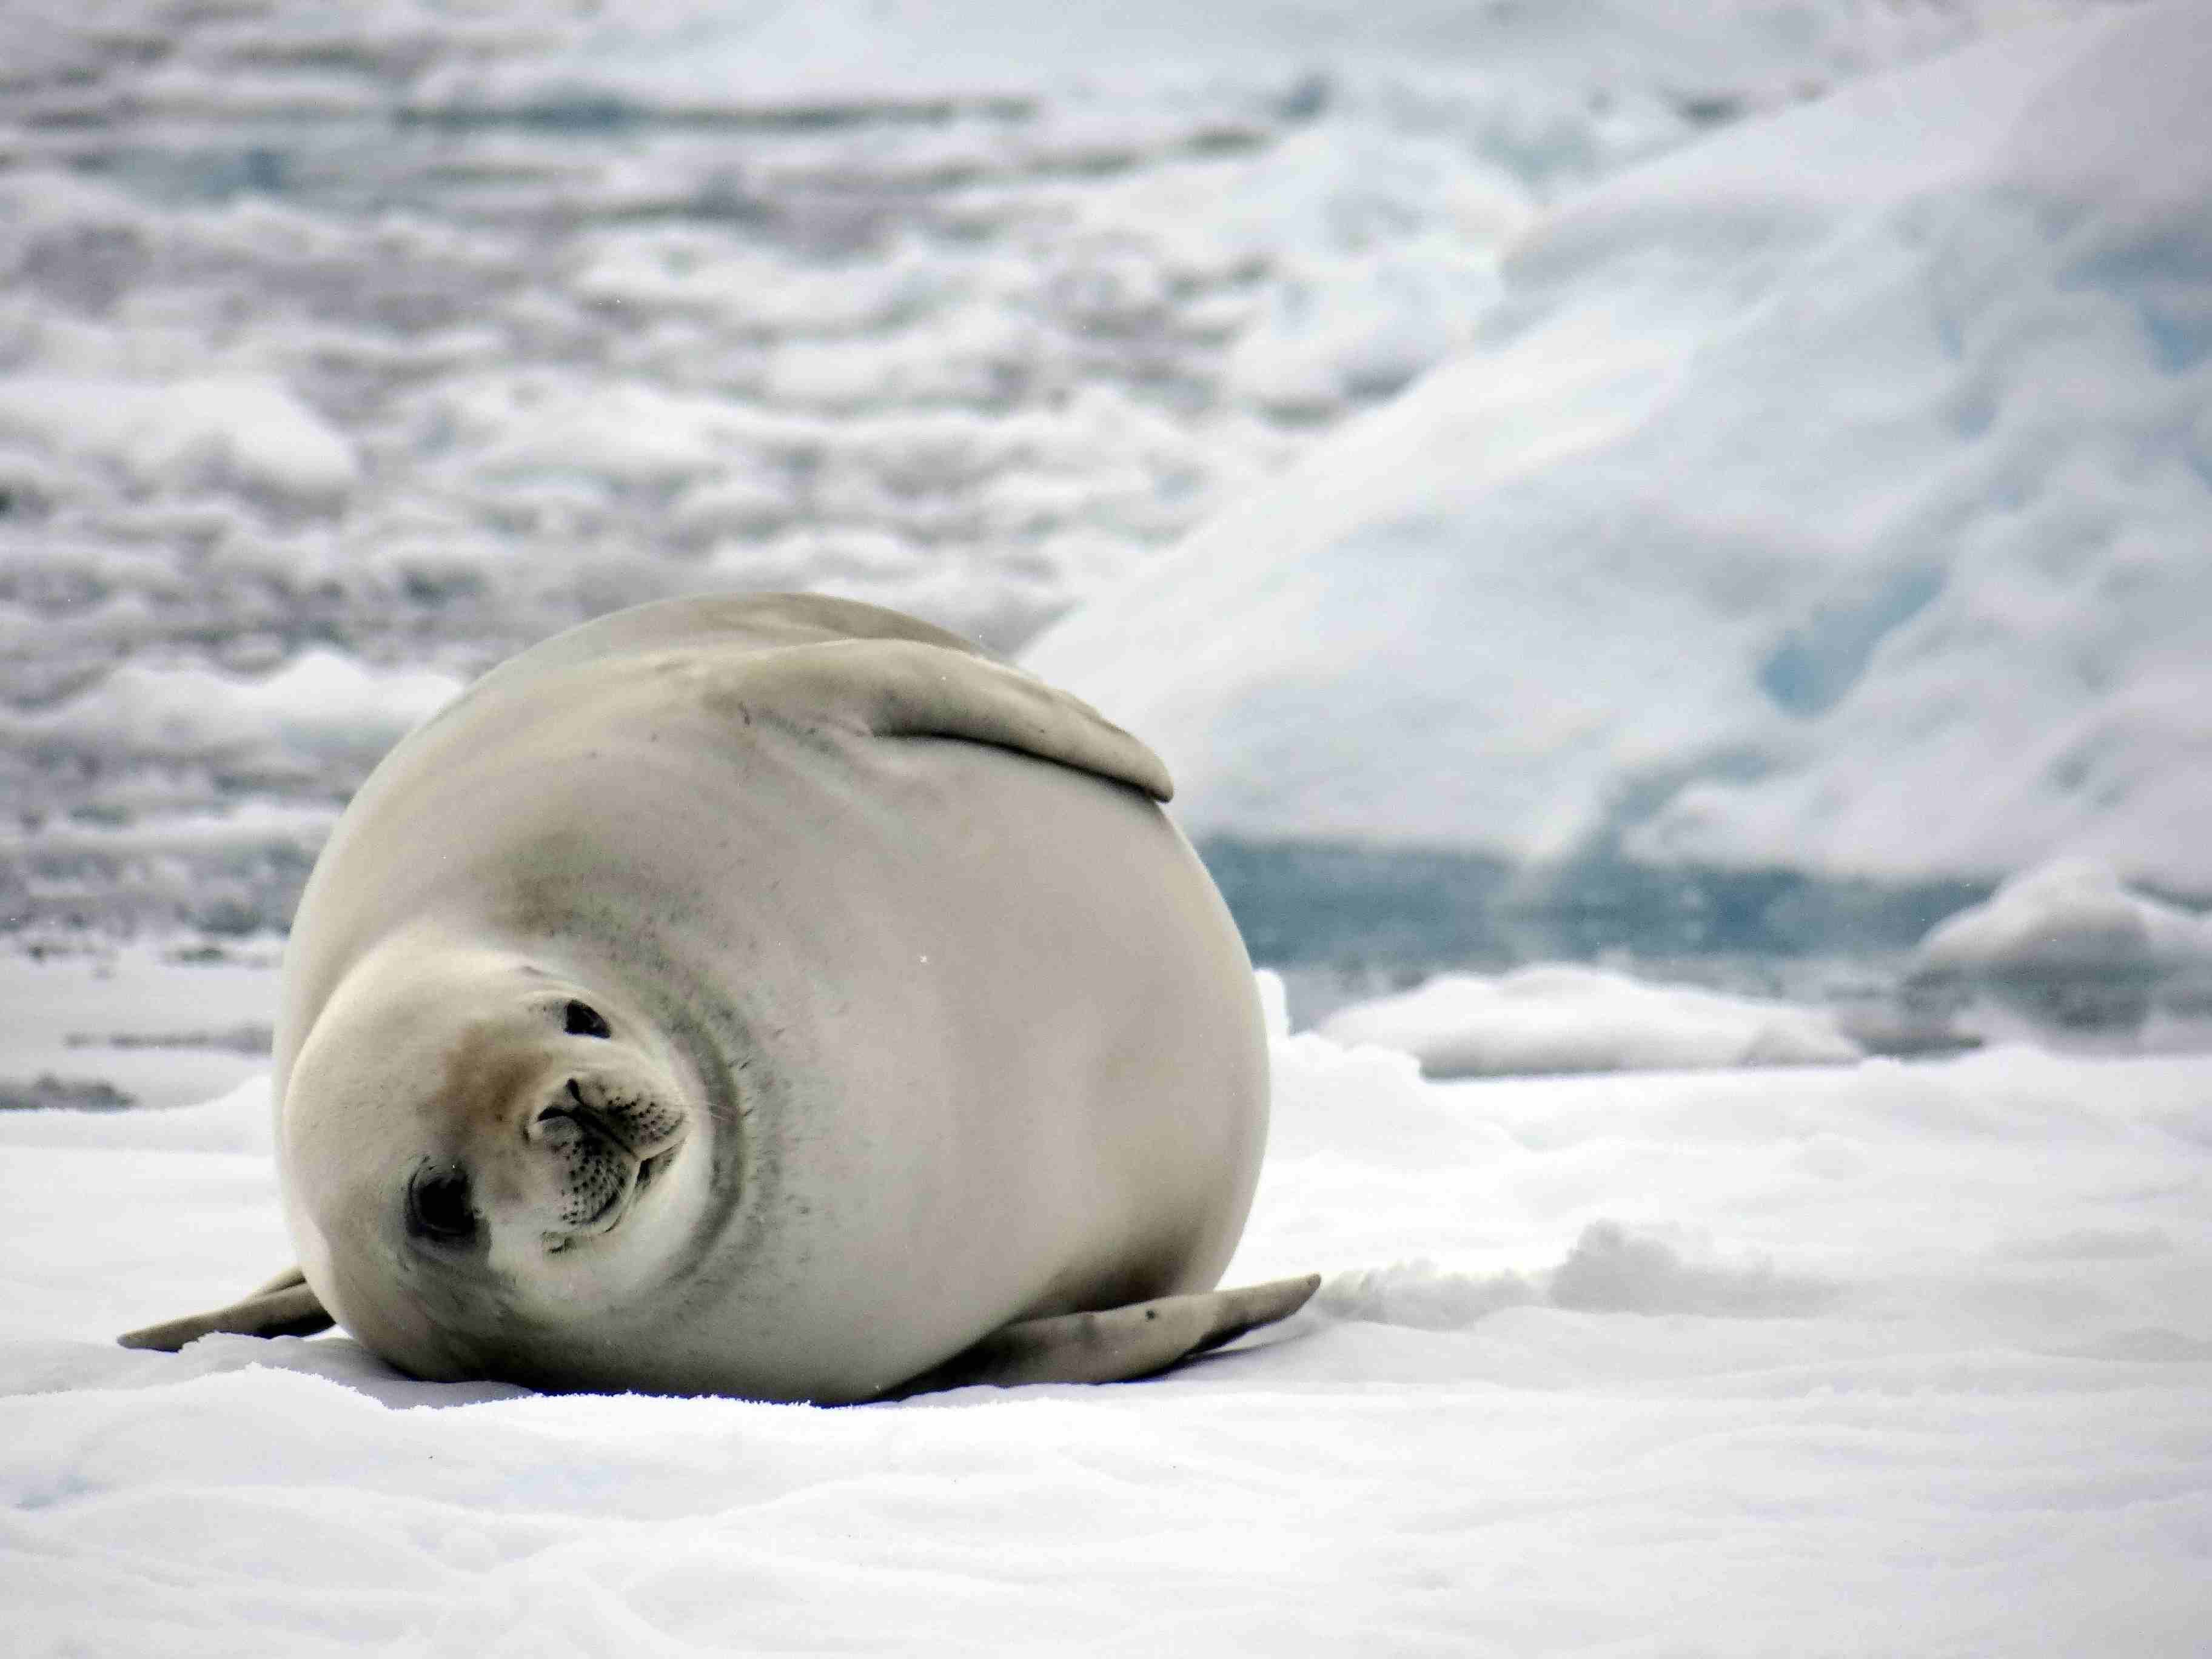 Crabeater seal in Neko Harbor, Antarctica